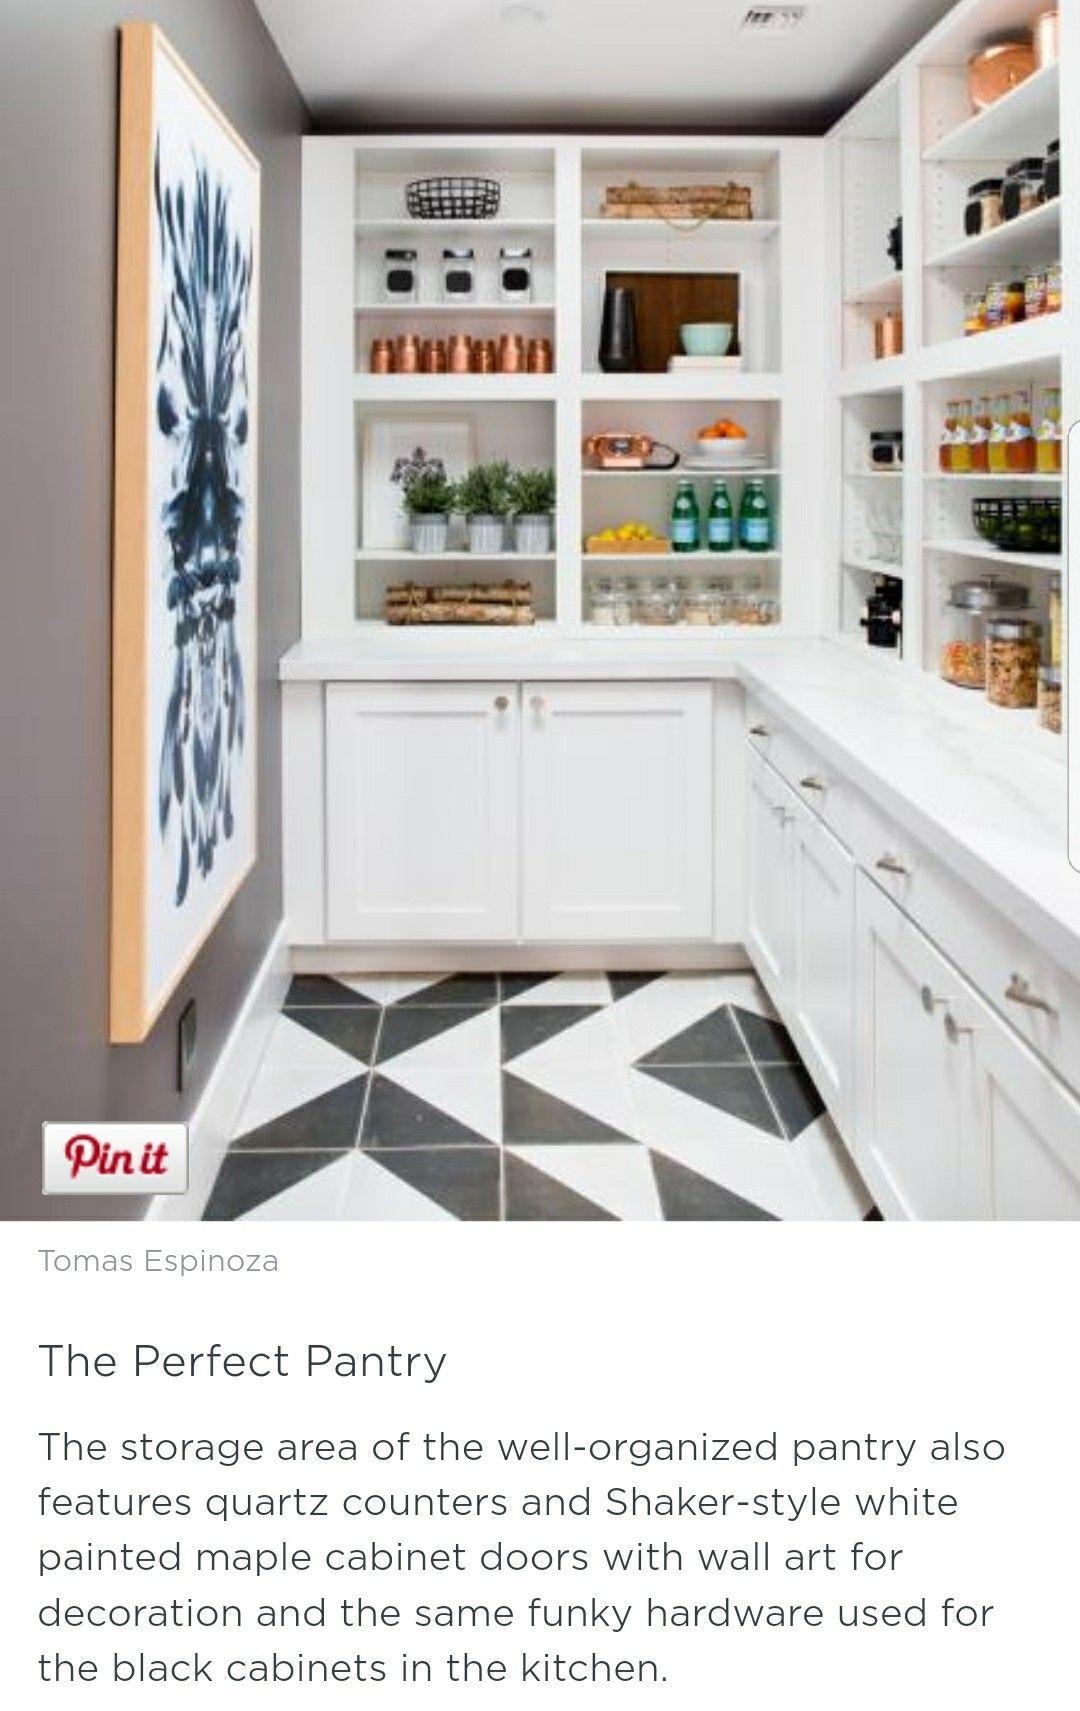 Pin by Marianne Cook-Monaco on HGTV 2017 Smart Home | Pinterest | Hgtv